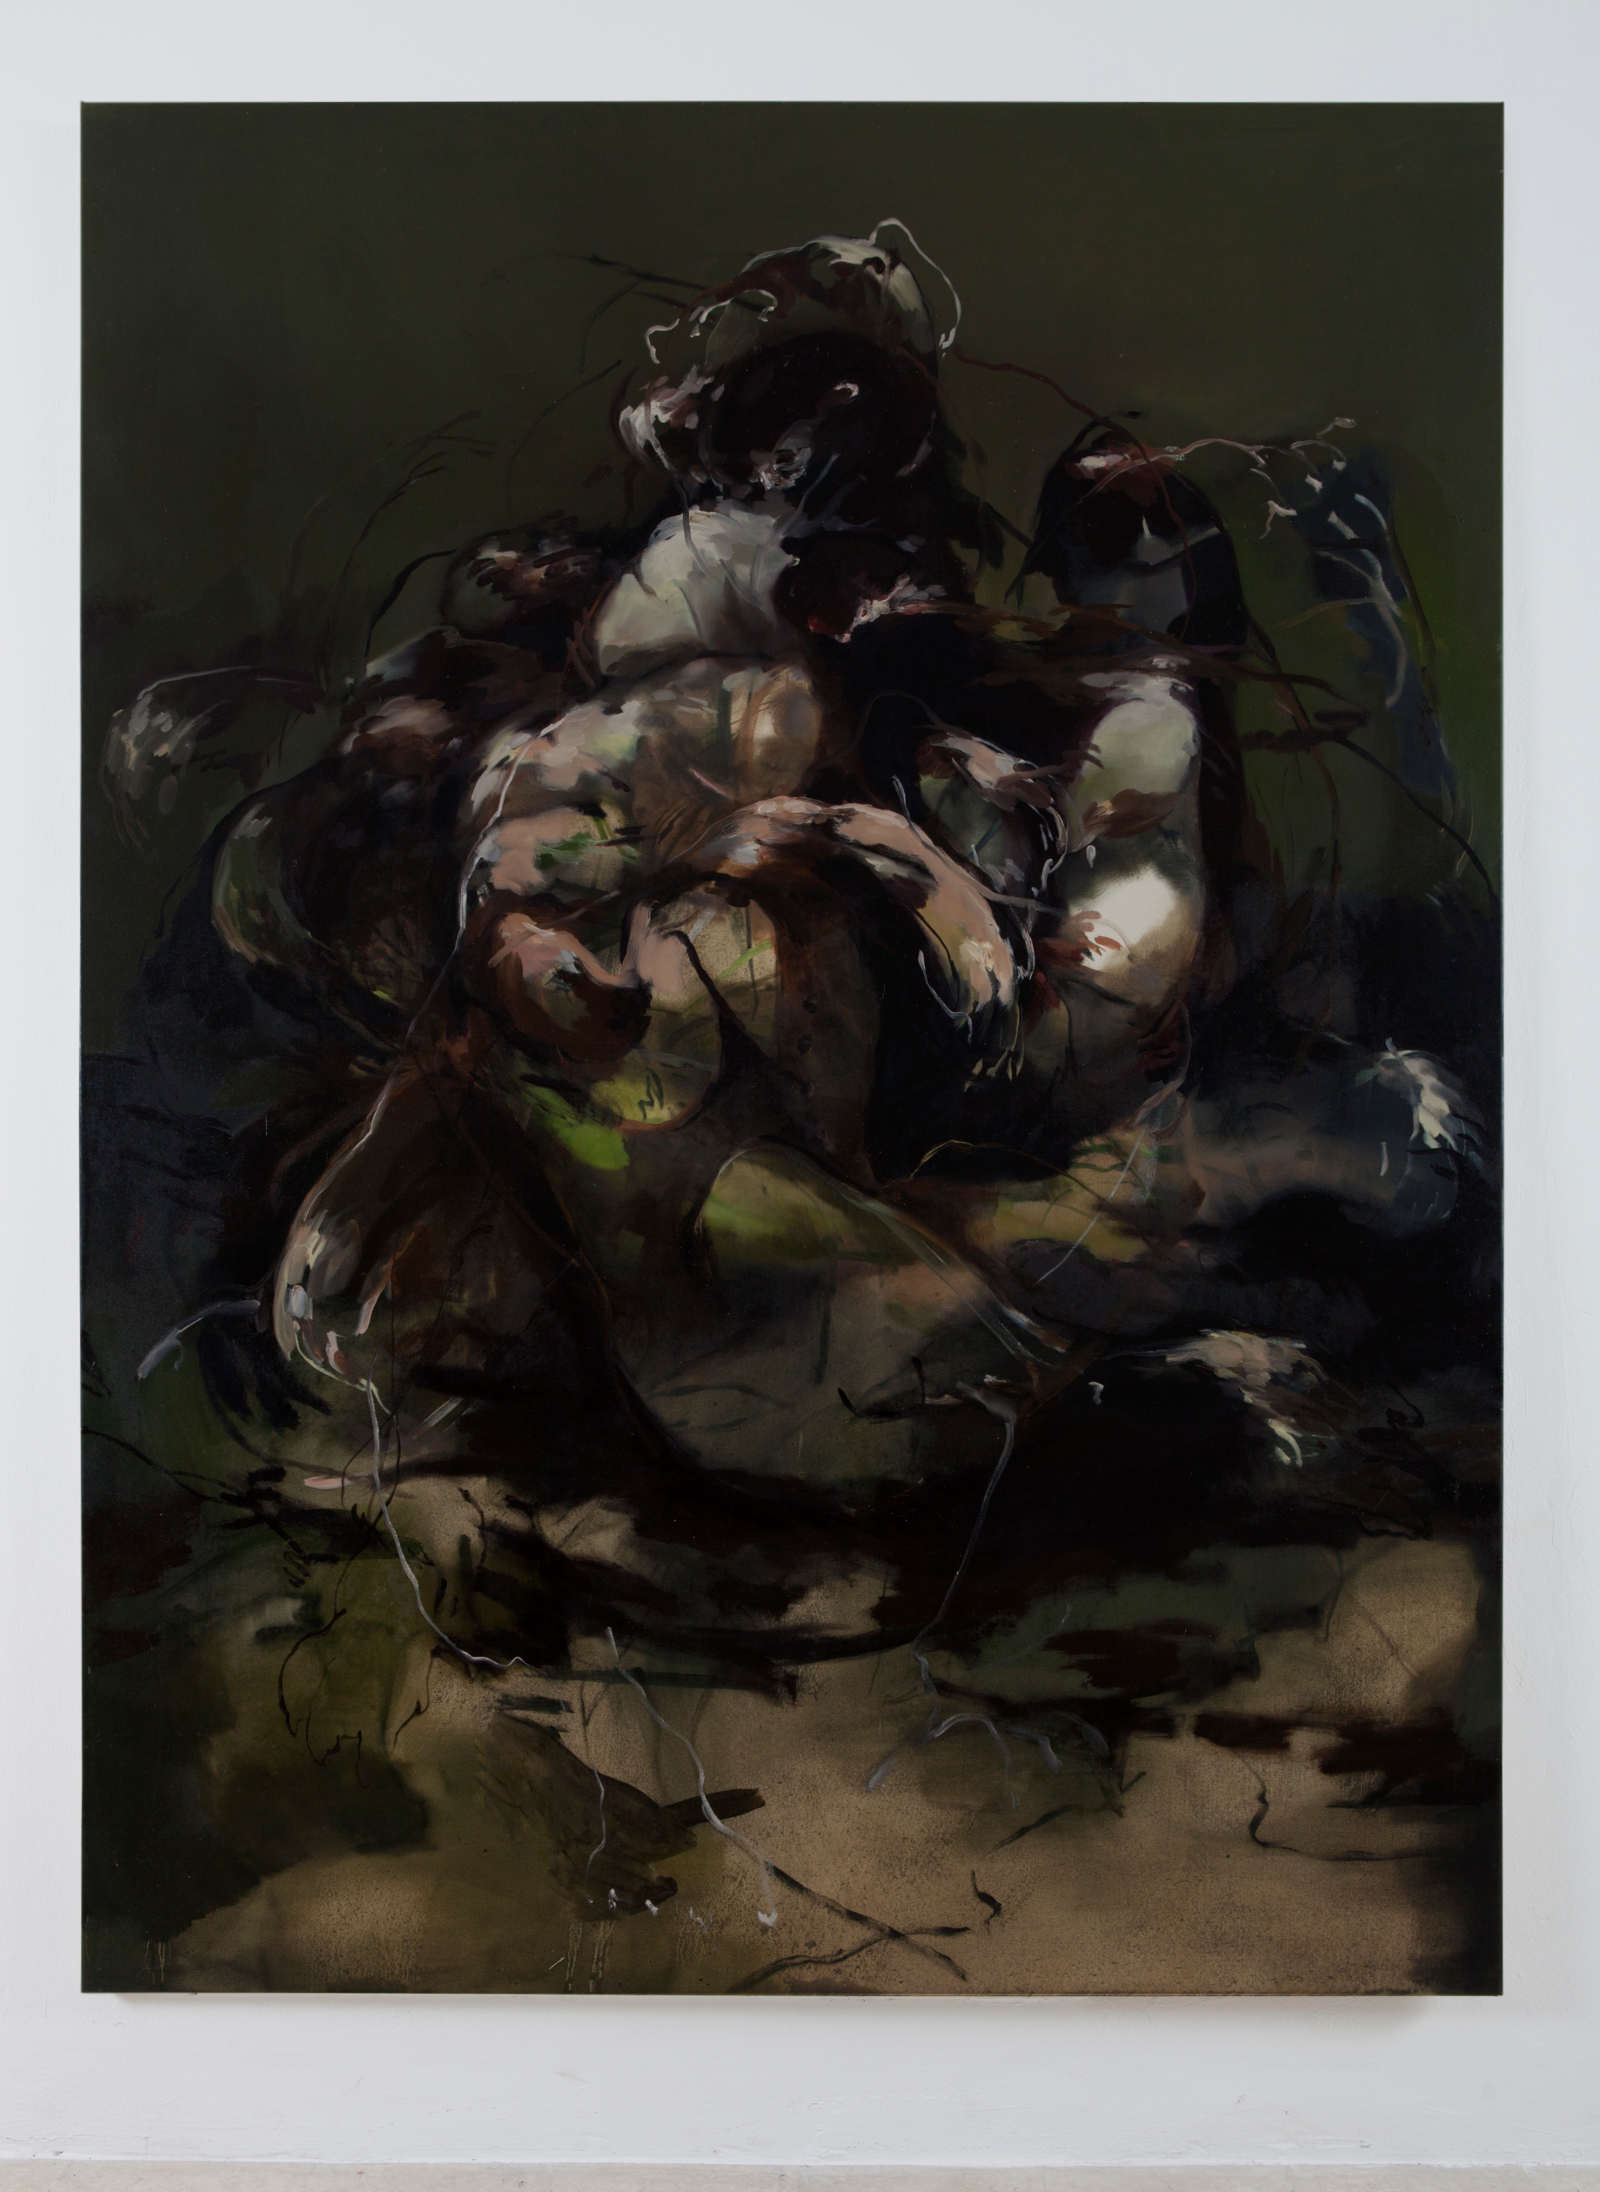 6. NPM, cani, 2015, olio su tela, 200x140cm